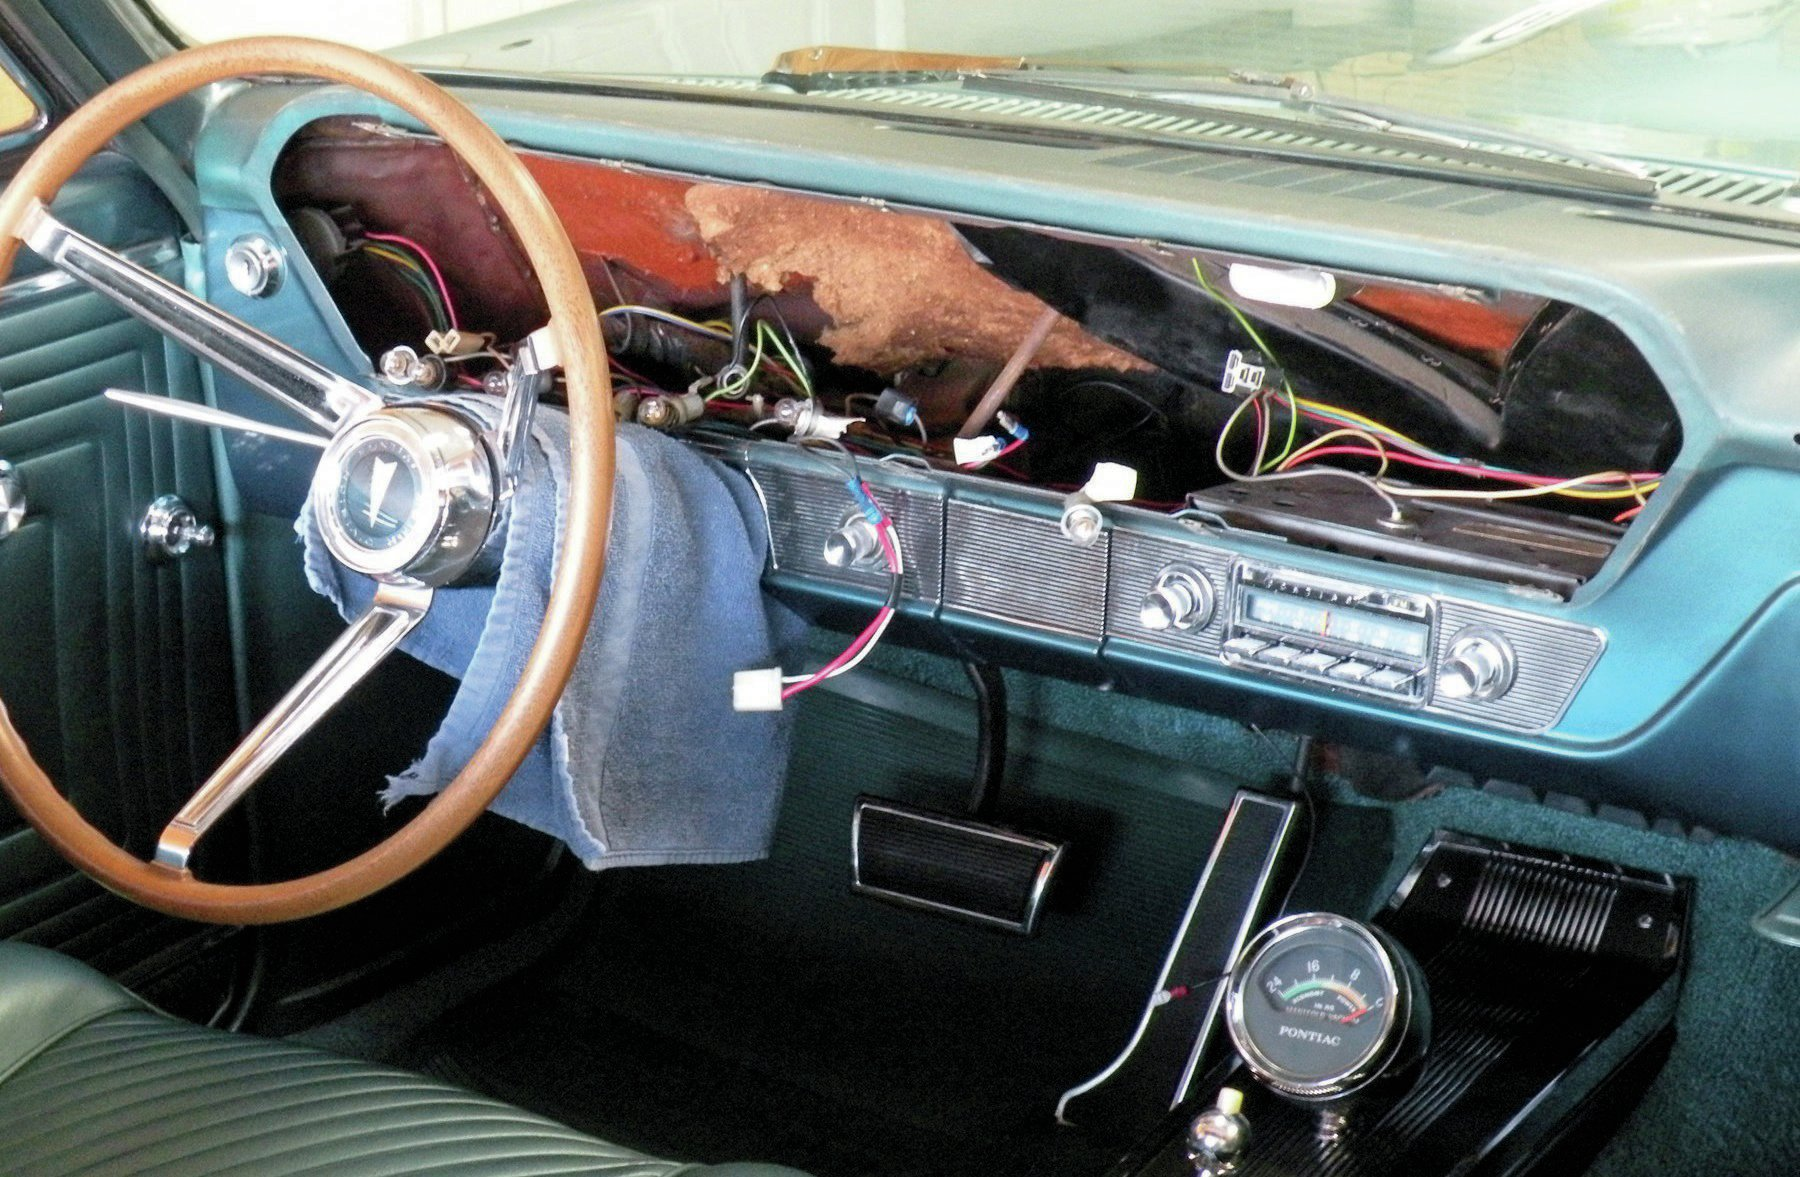 medium resolution of 1965 pontiac gto rally gauge wiring diagram electrical wiring diagrams 1967 gto dash wiring diagram 1965